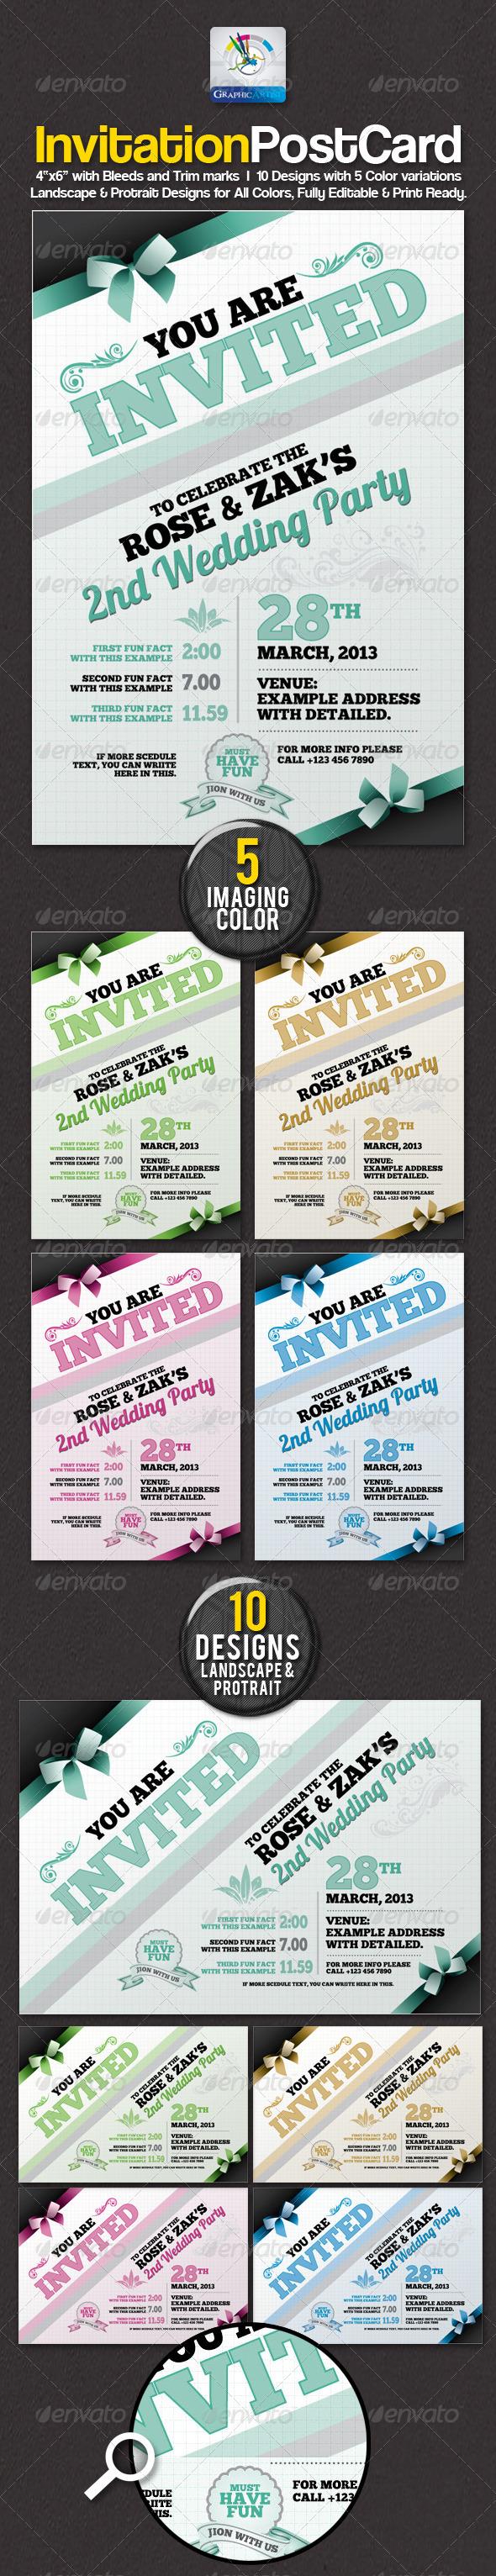 Modern Invitation Postcard Sets - Invitations Cards & Invites